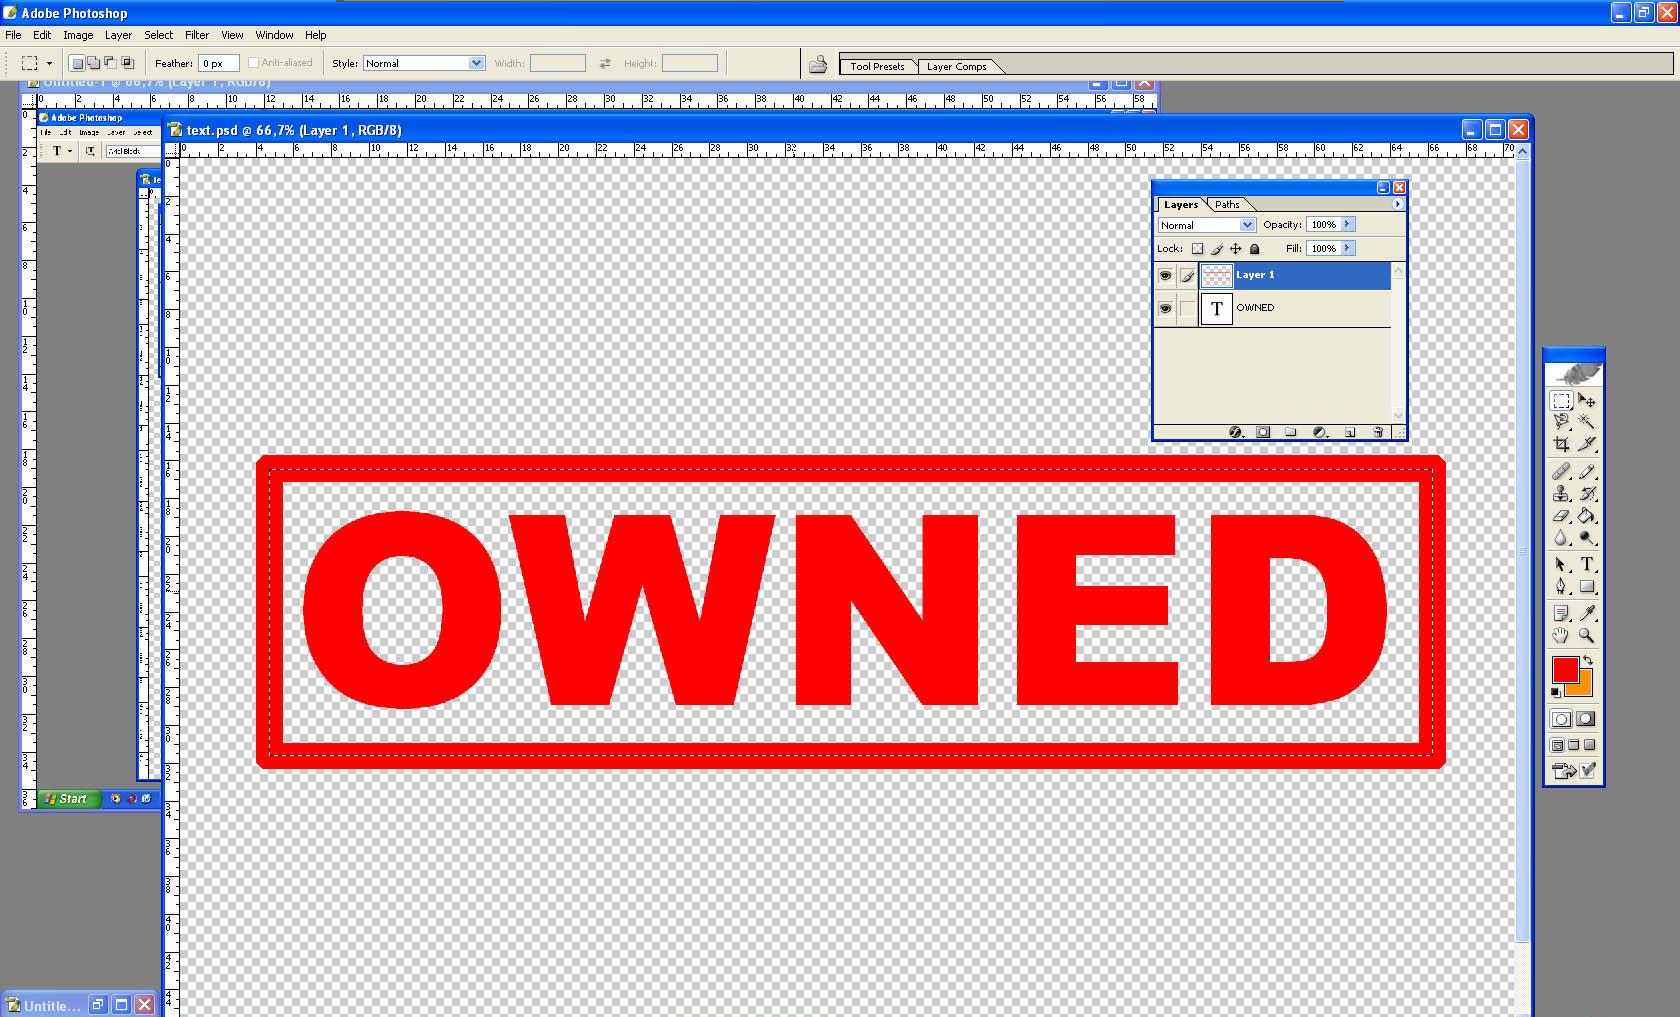 owned_part_3.jpg